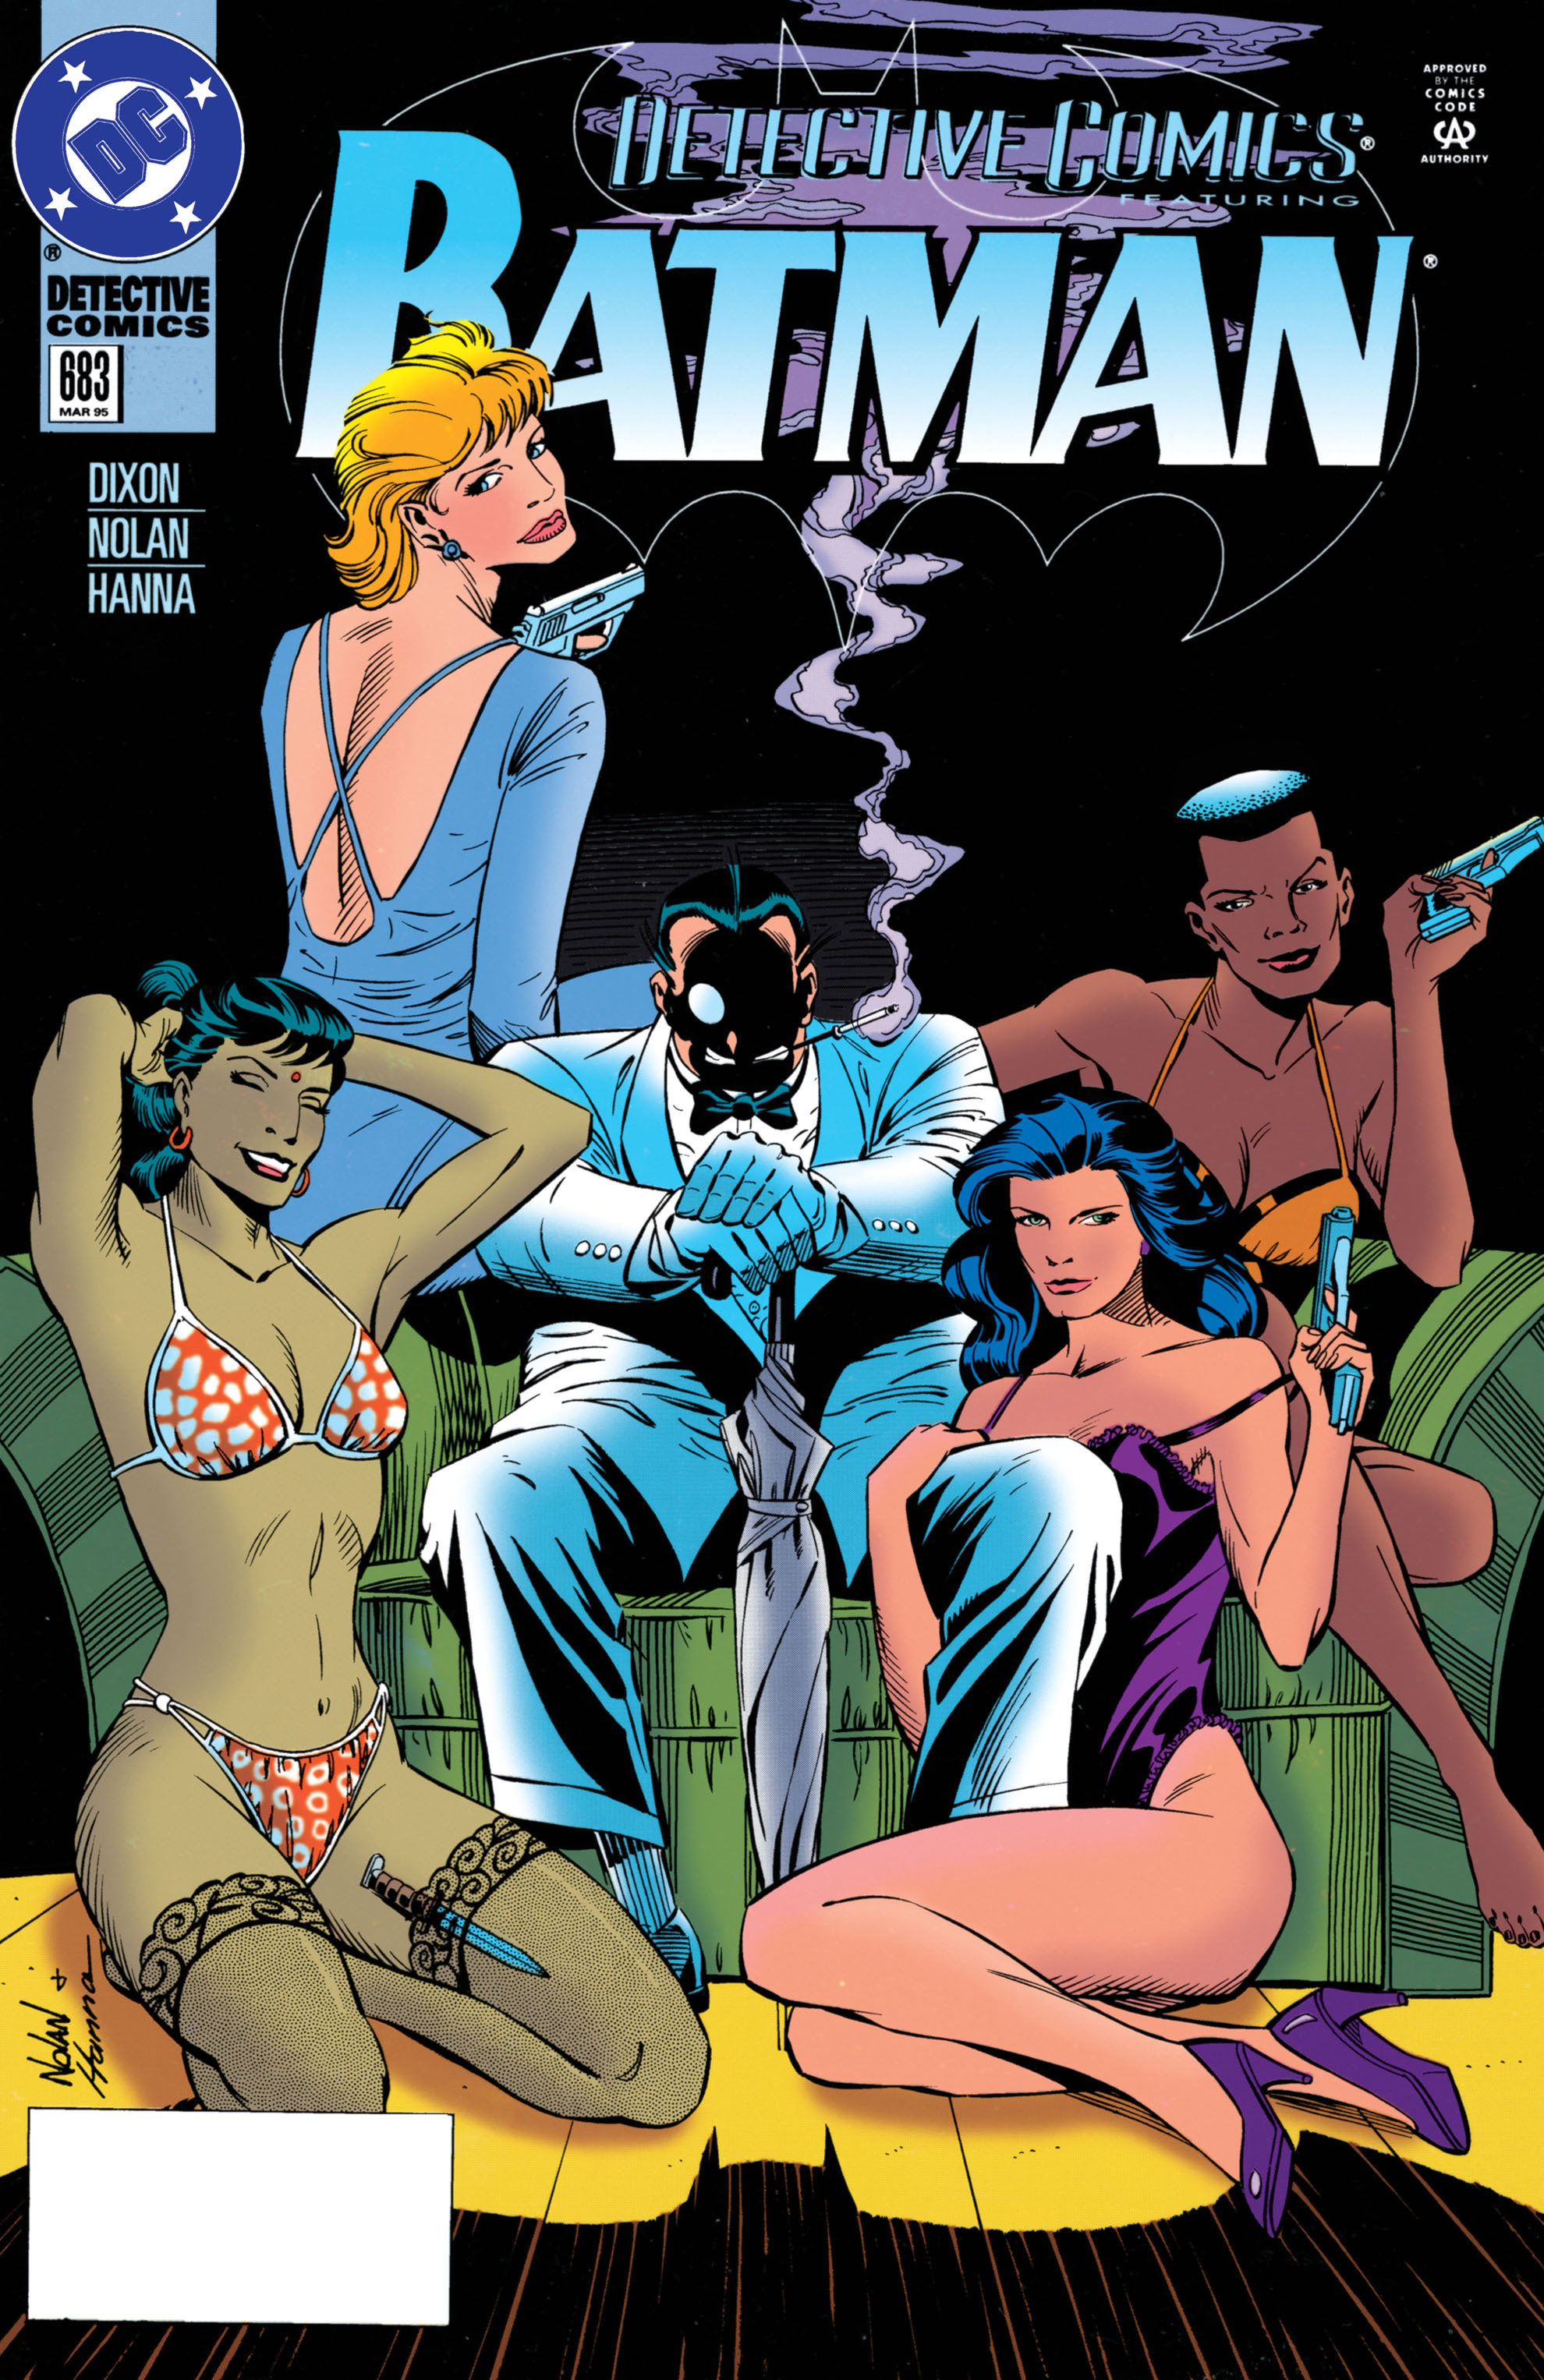 Detective Comics (1937) 683 Page 1